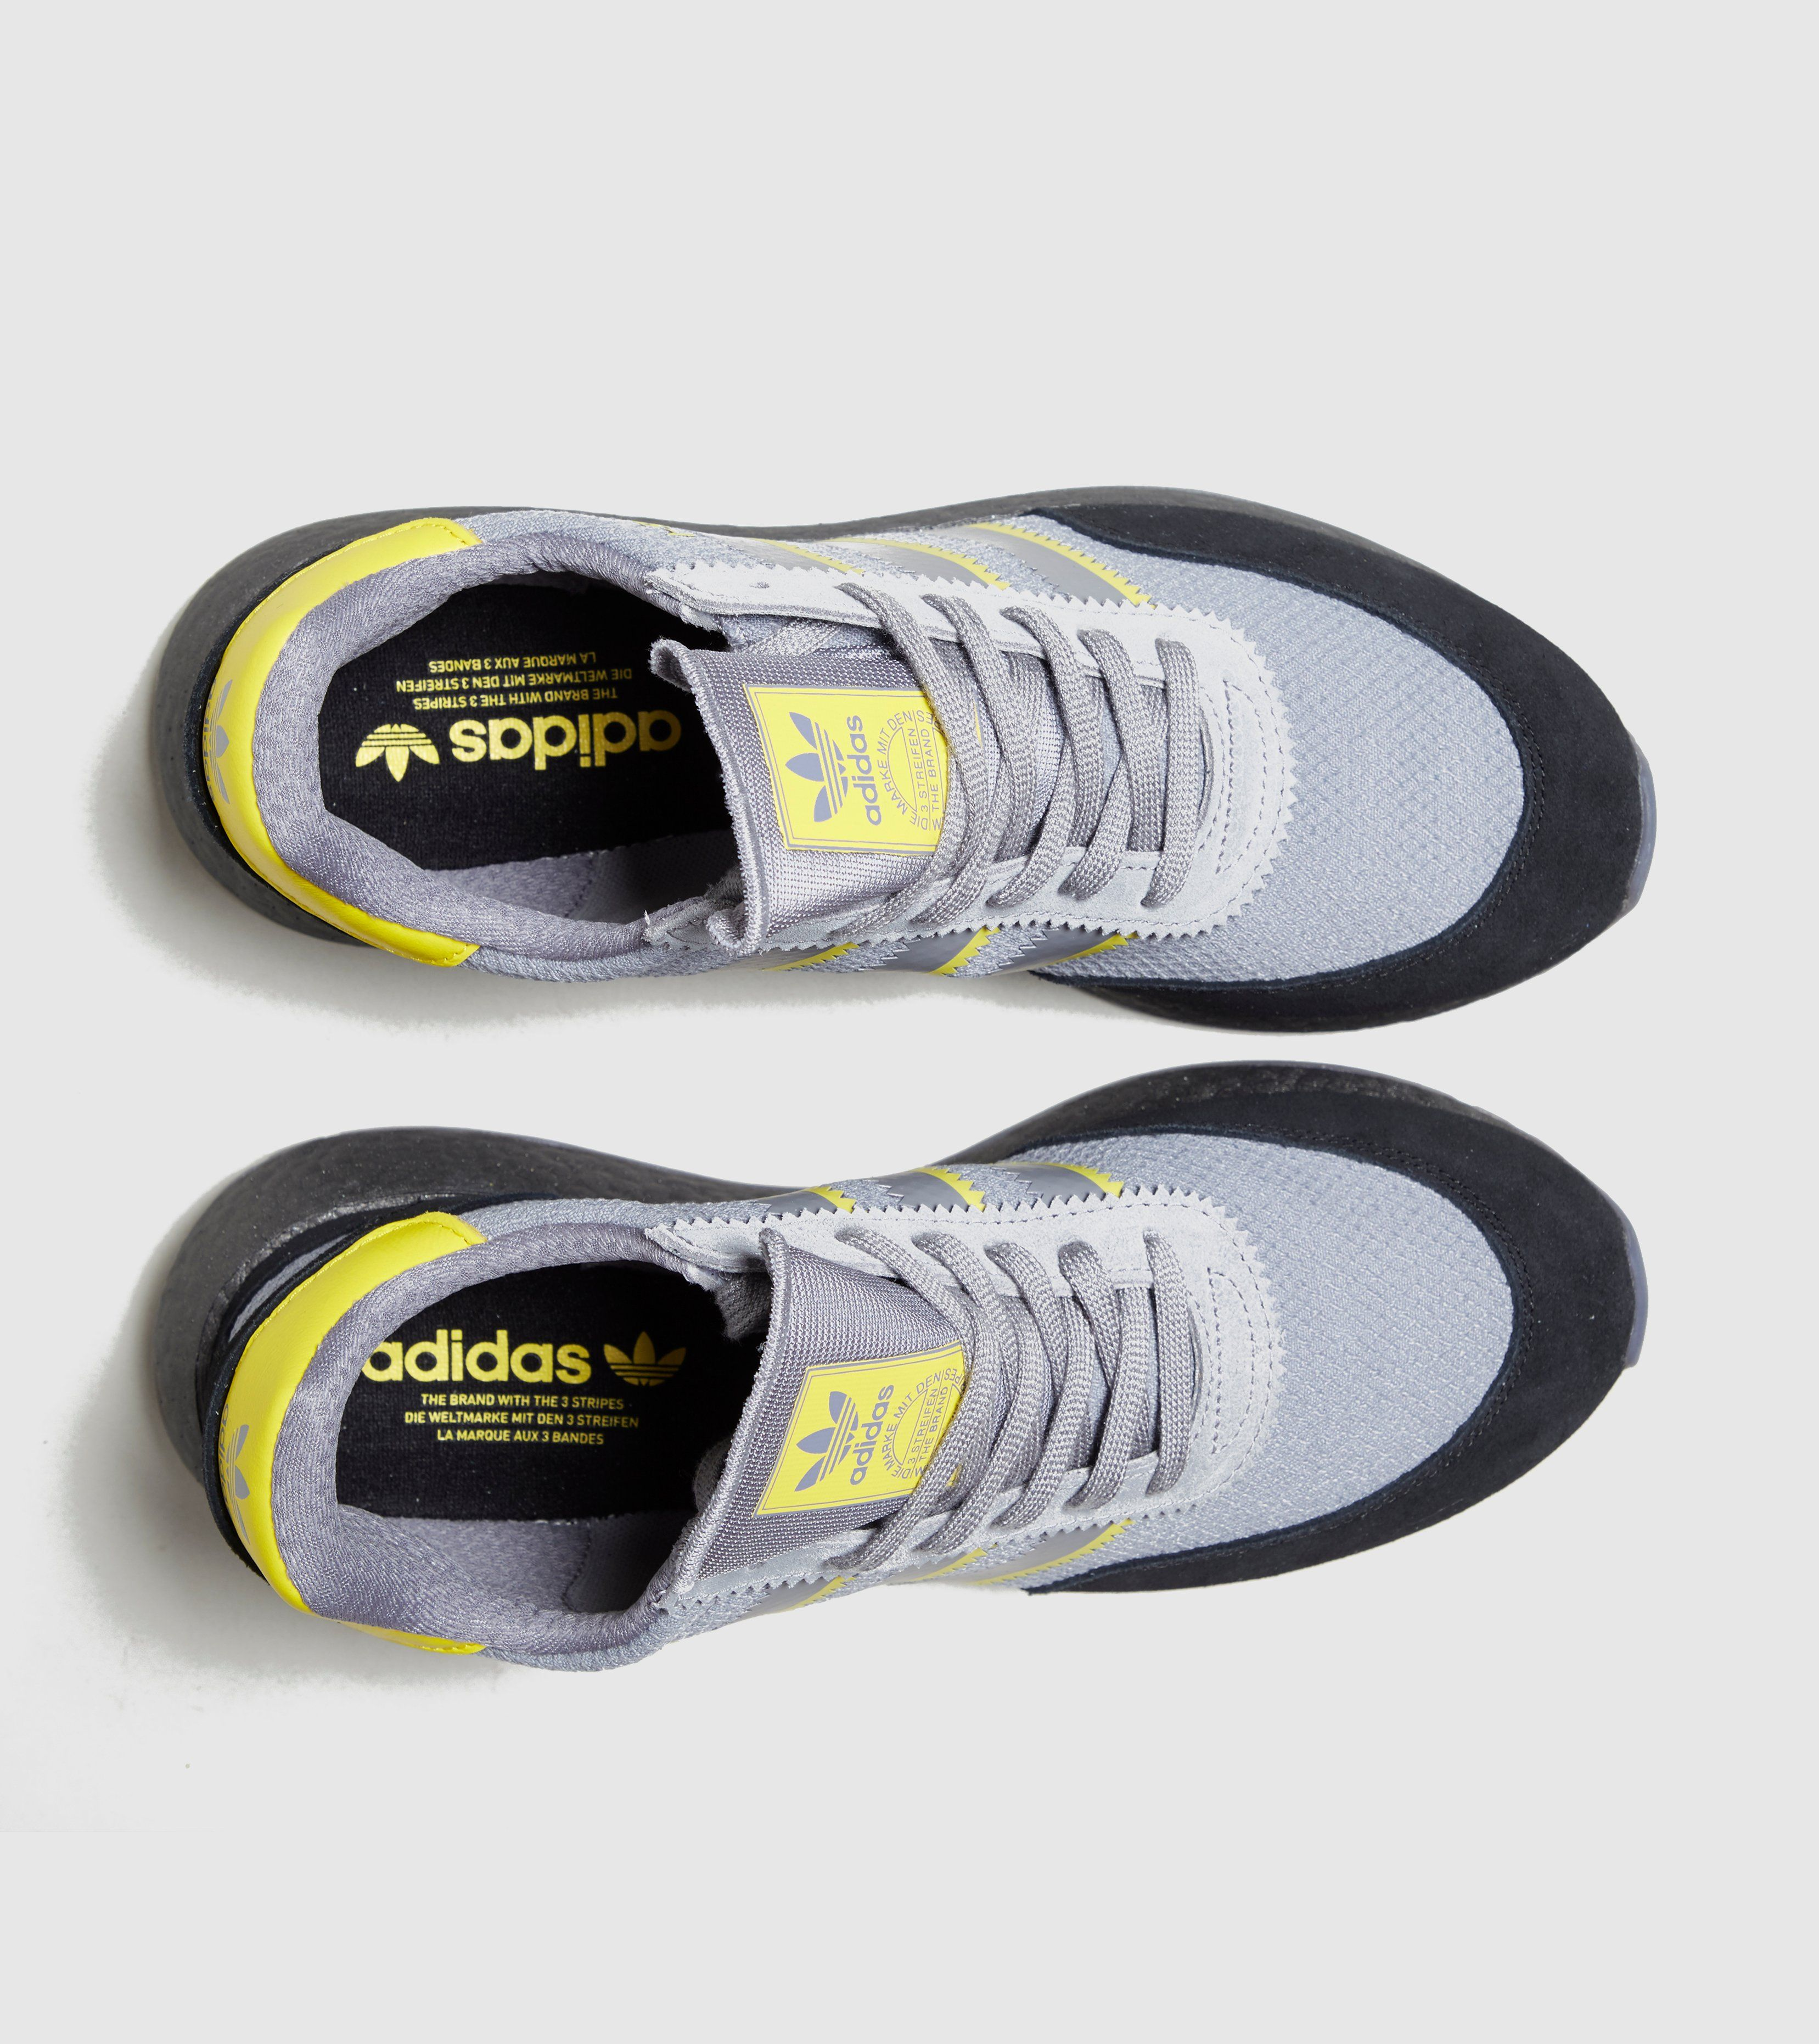 adidas Originals I-5923 'Manchester Showers' - size? Exclusive